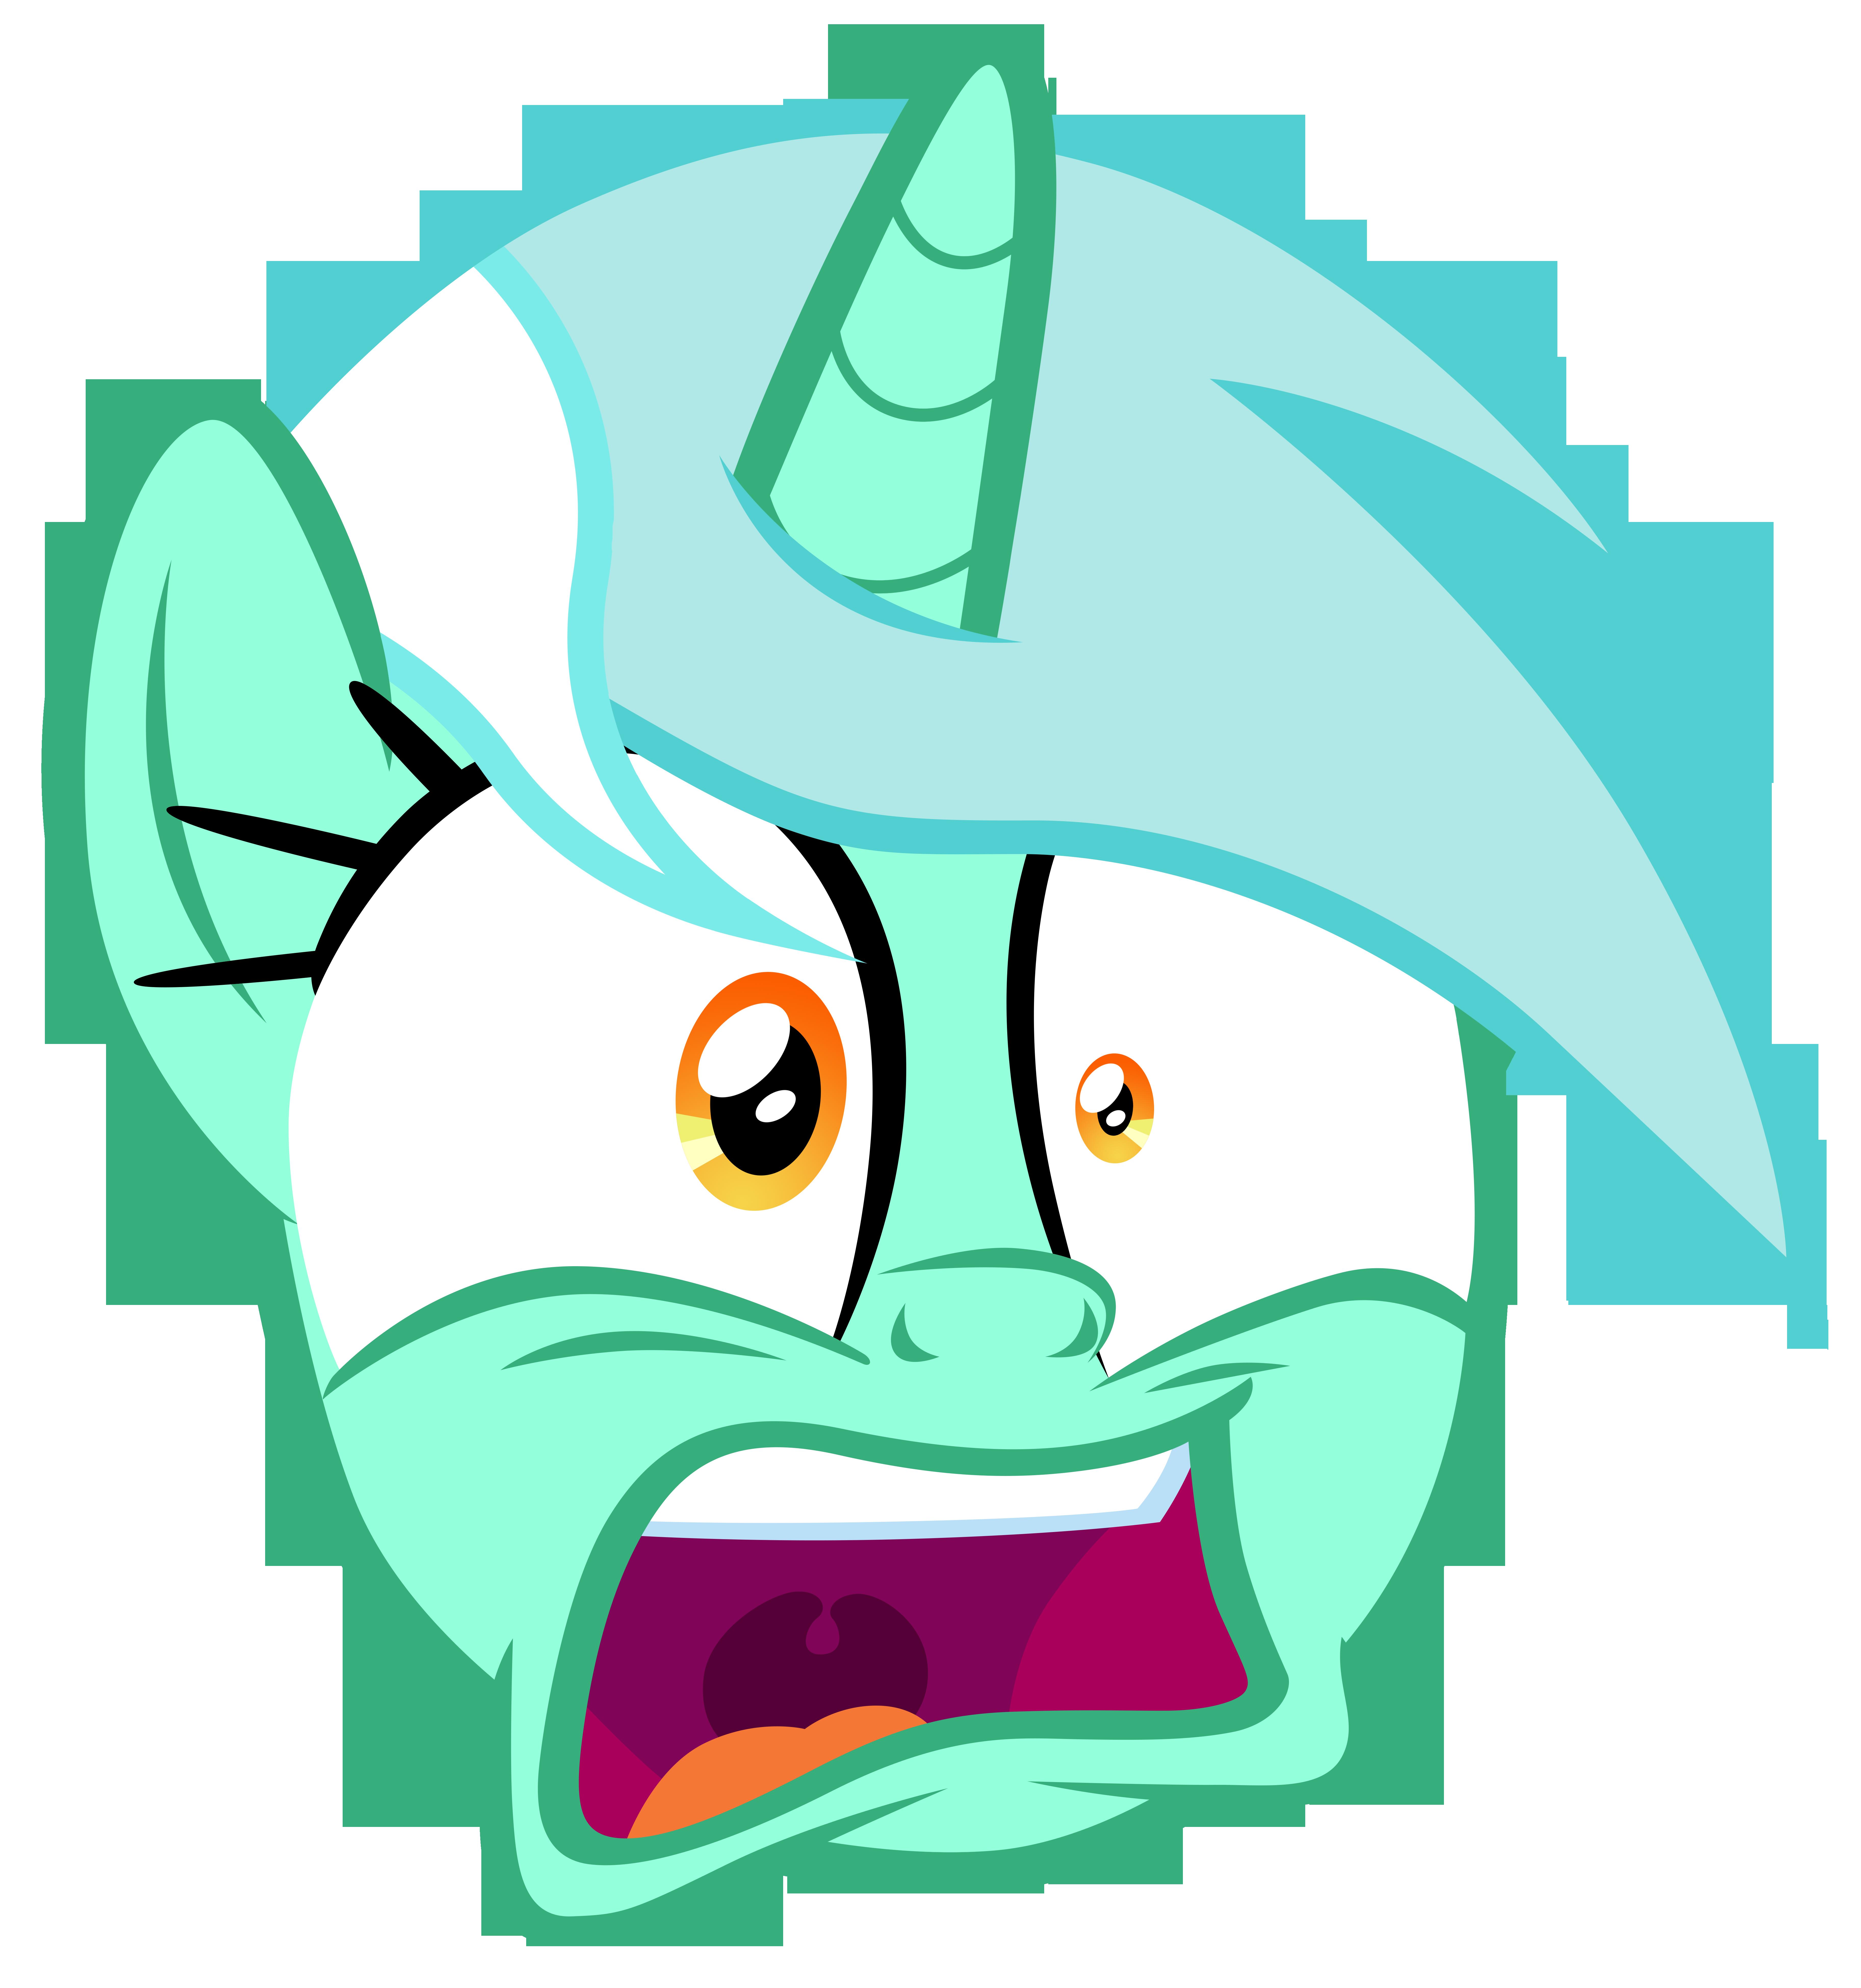 Lyra startled by Cozy Glow